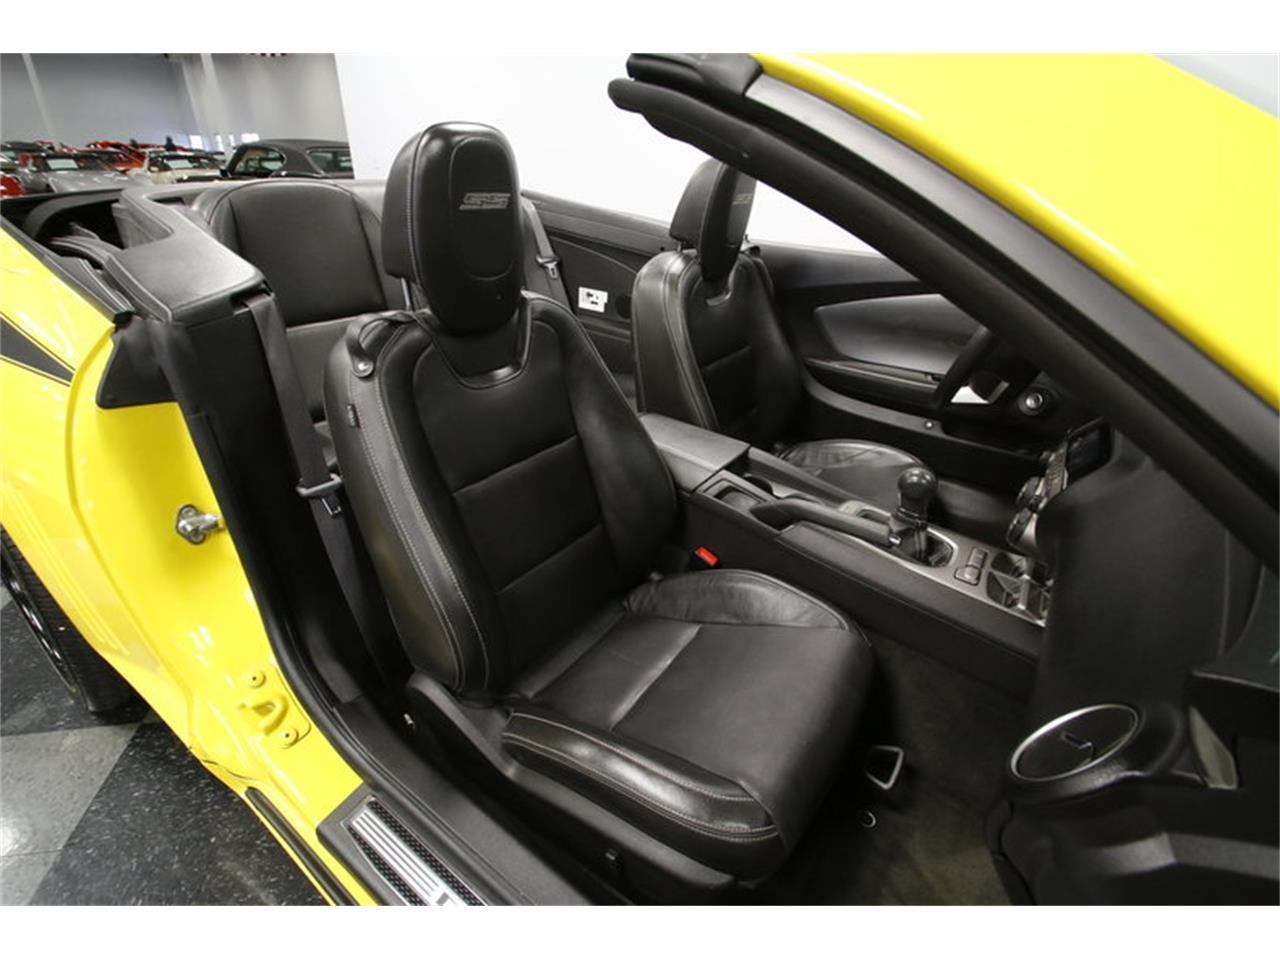 Large Picture of '11 Camaro located in North Carolina - $34,995.00 - MZEP